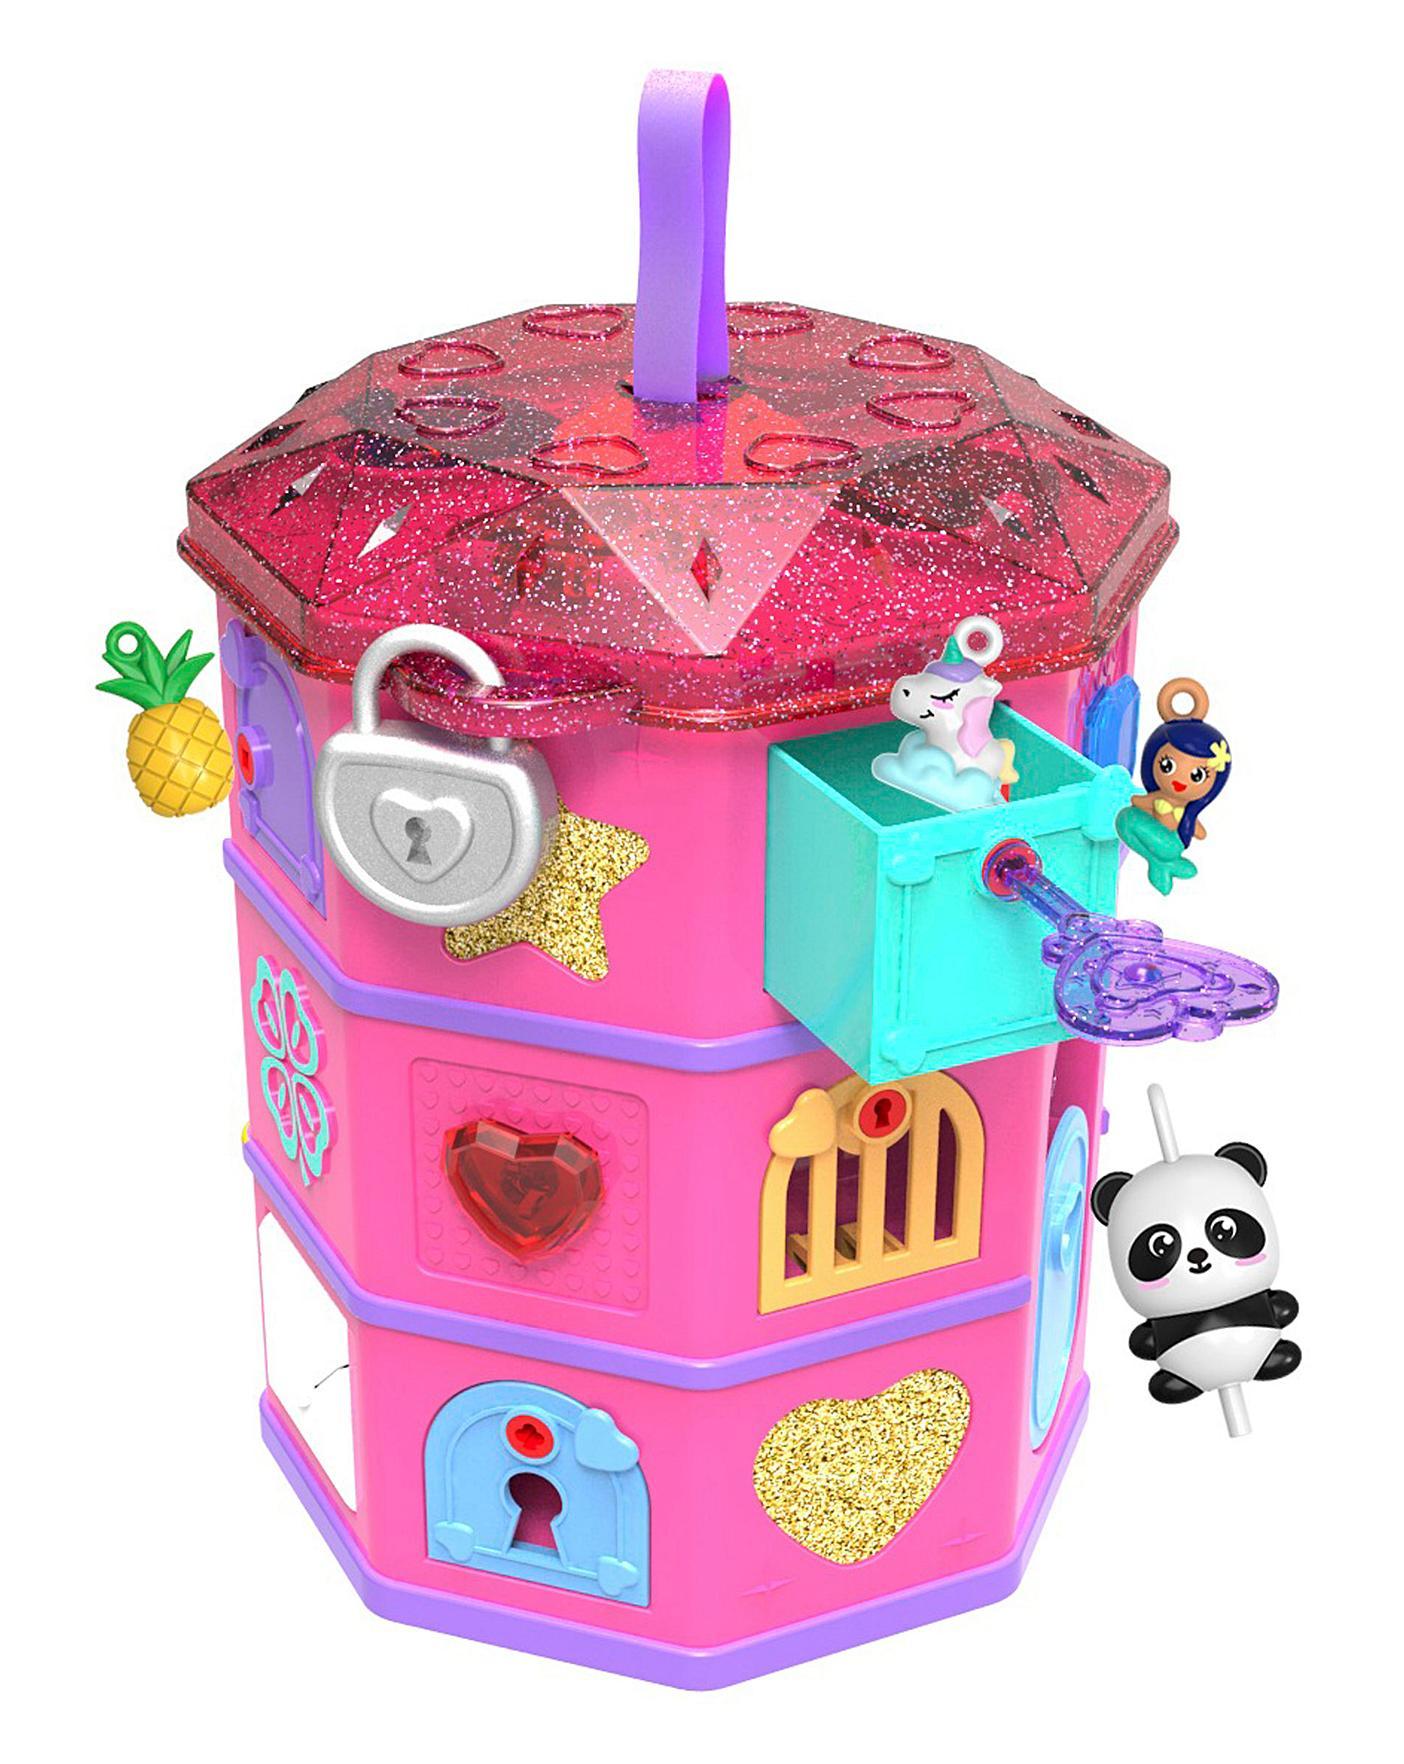 Funlockets Secret Surprise Treasure Hunt Tower